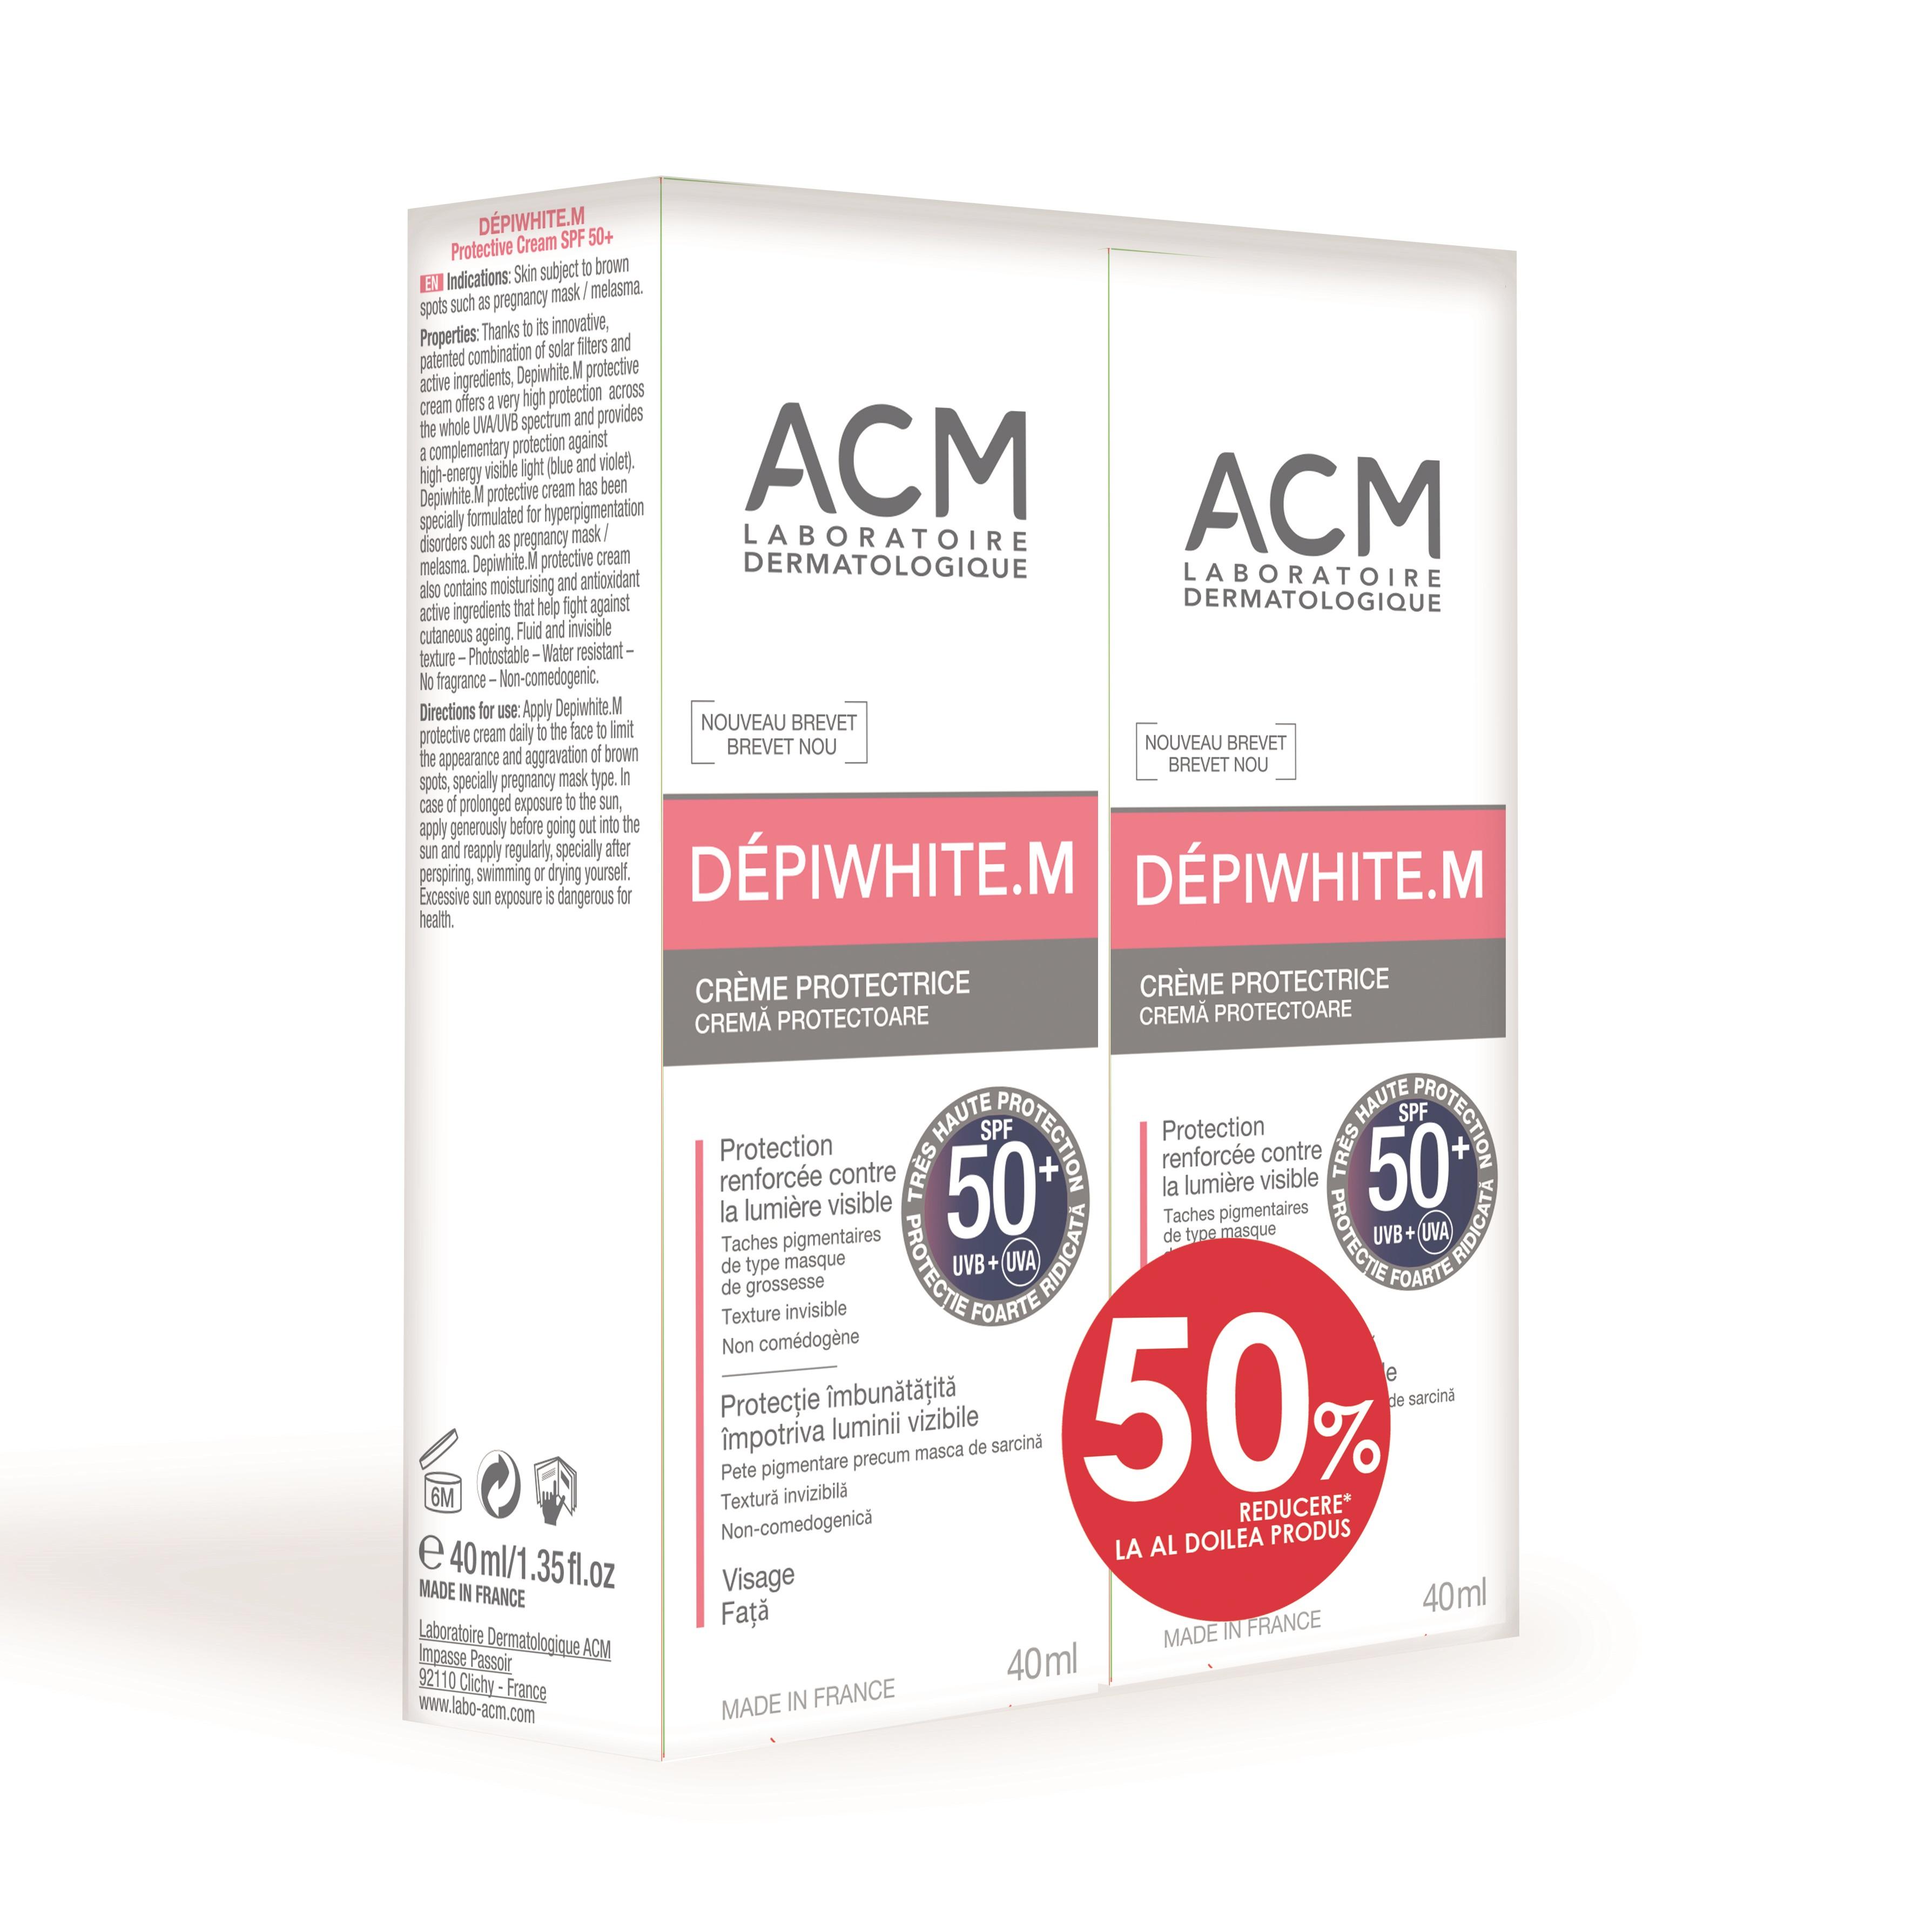 Pachet Cremă de protecție Depiwhite M SPF 50+, 40 ml + 40 ml, Acm (50% reducere la al doilea produs)